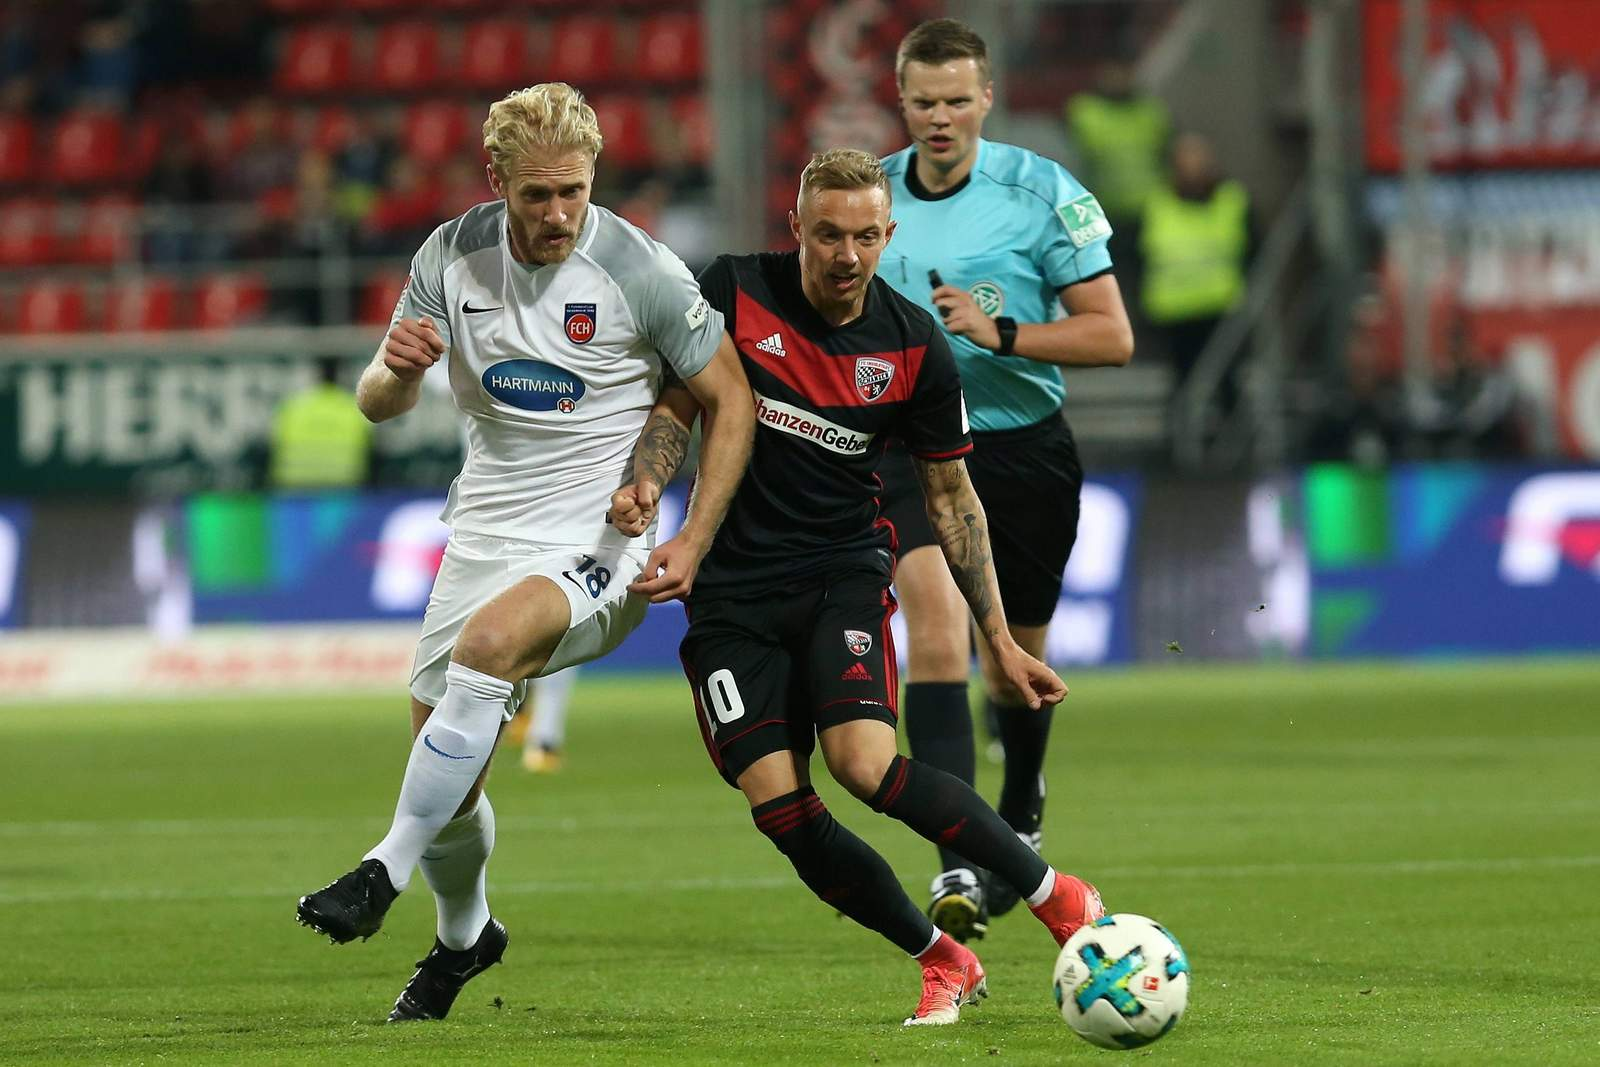 Kann sich Sebastian Griesbeck gegen Sonny Kittel behaupten? Jetzt auf Ingolstadt gegen Heidenheim wetten.